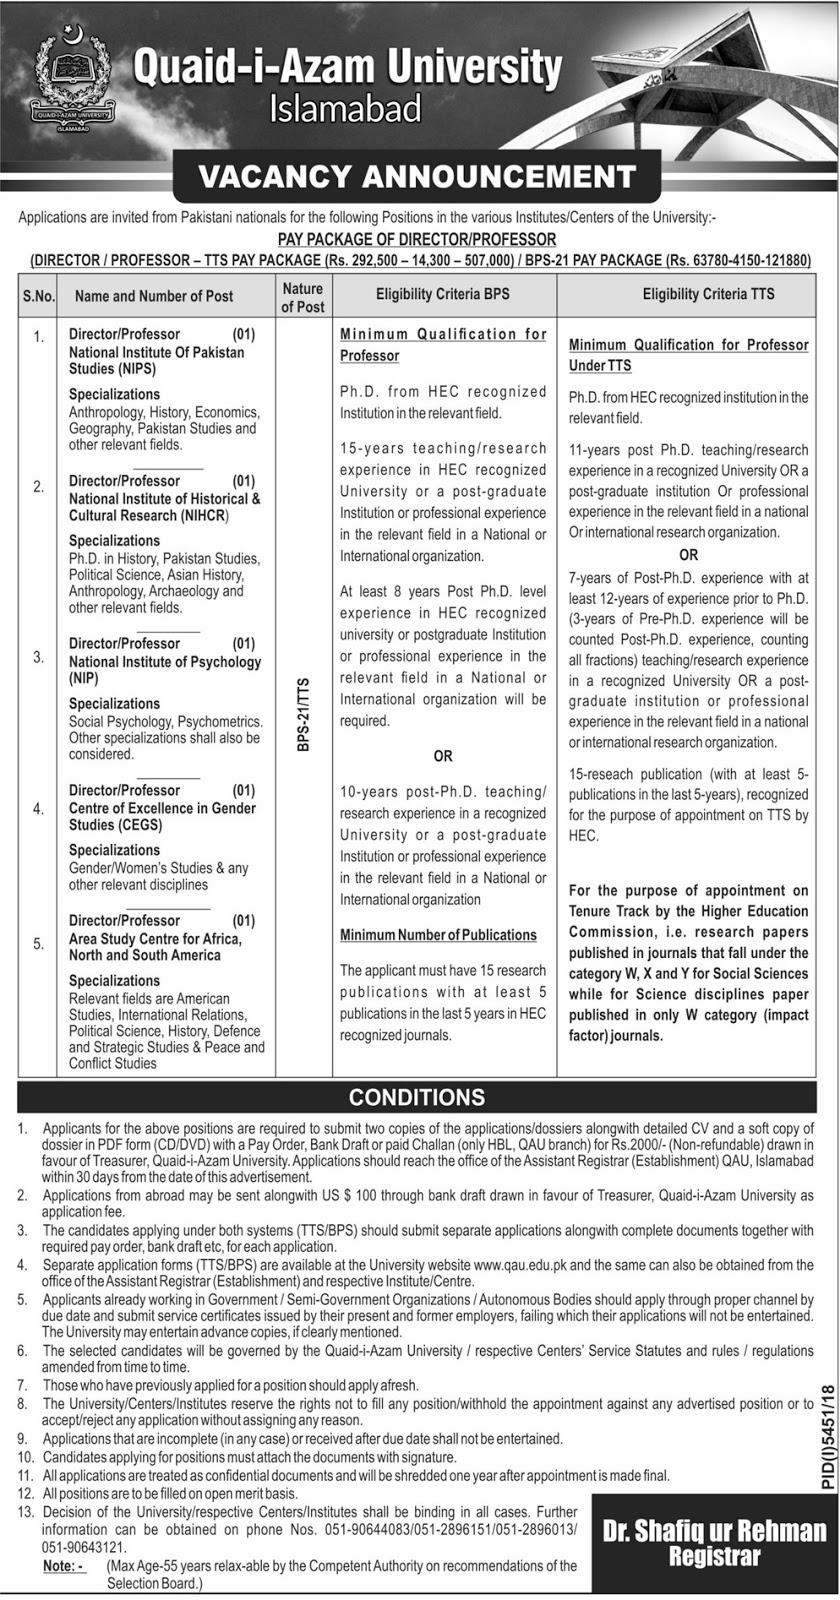 Advertisement of Quaid-i-Azam University Islamabad Jobs